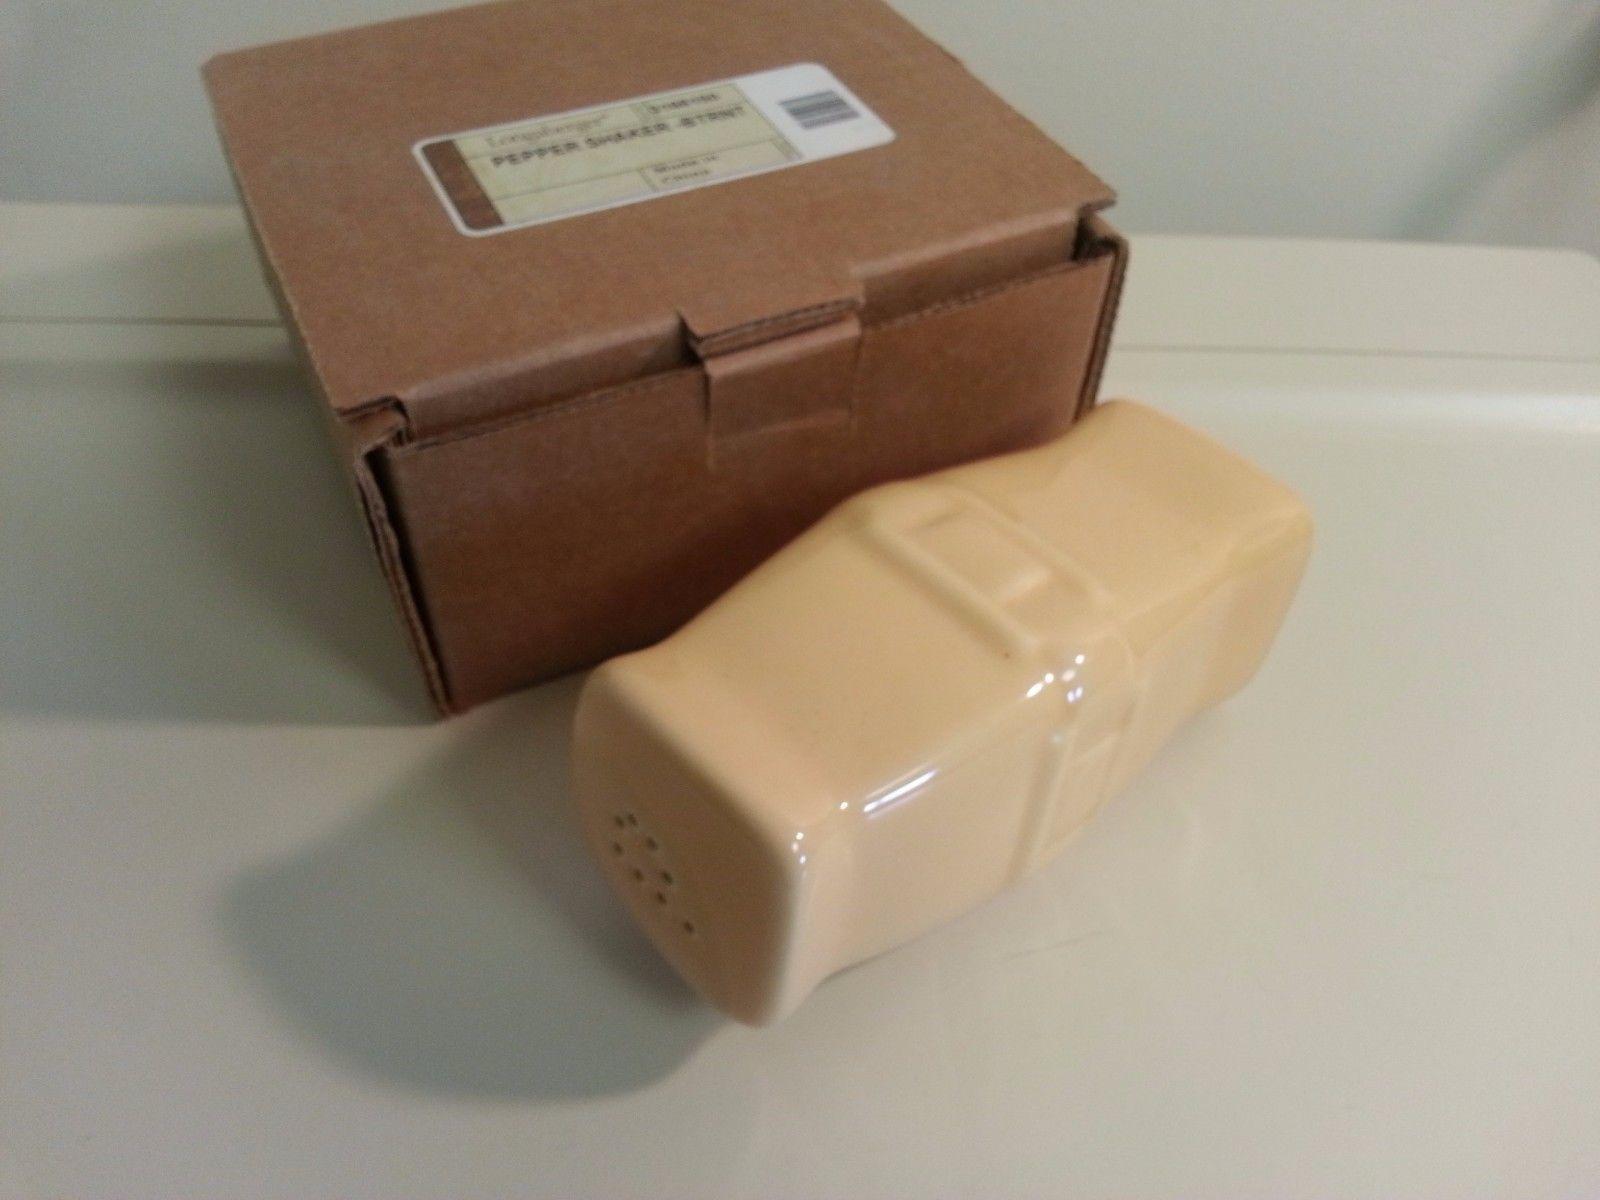 Longaberger Pottery Butternut Pepper Shaker New in Box 3166150